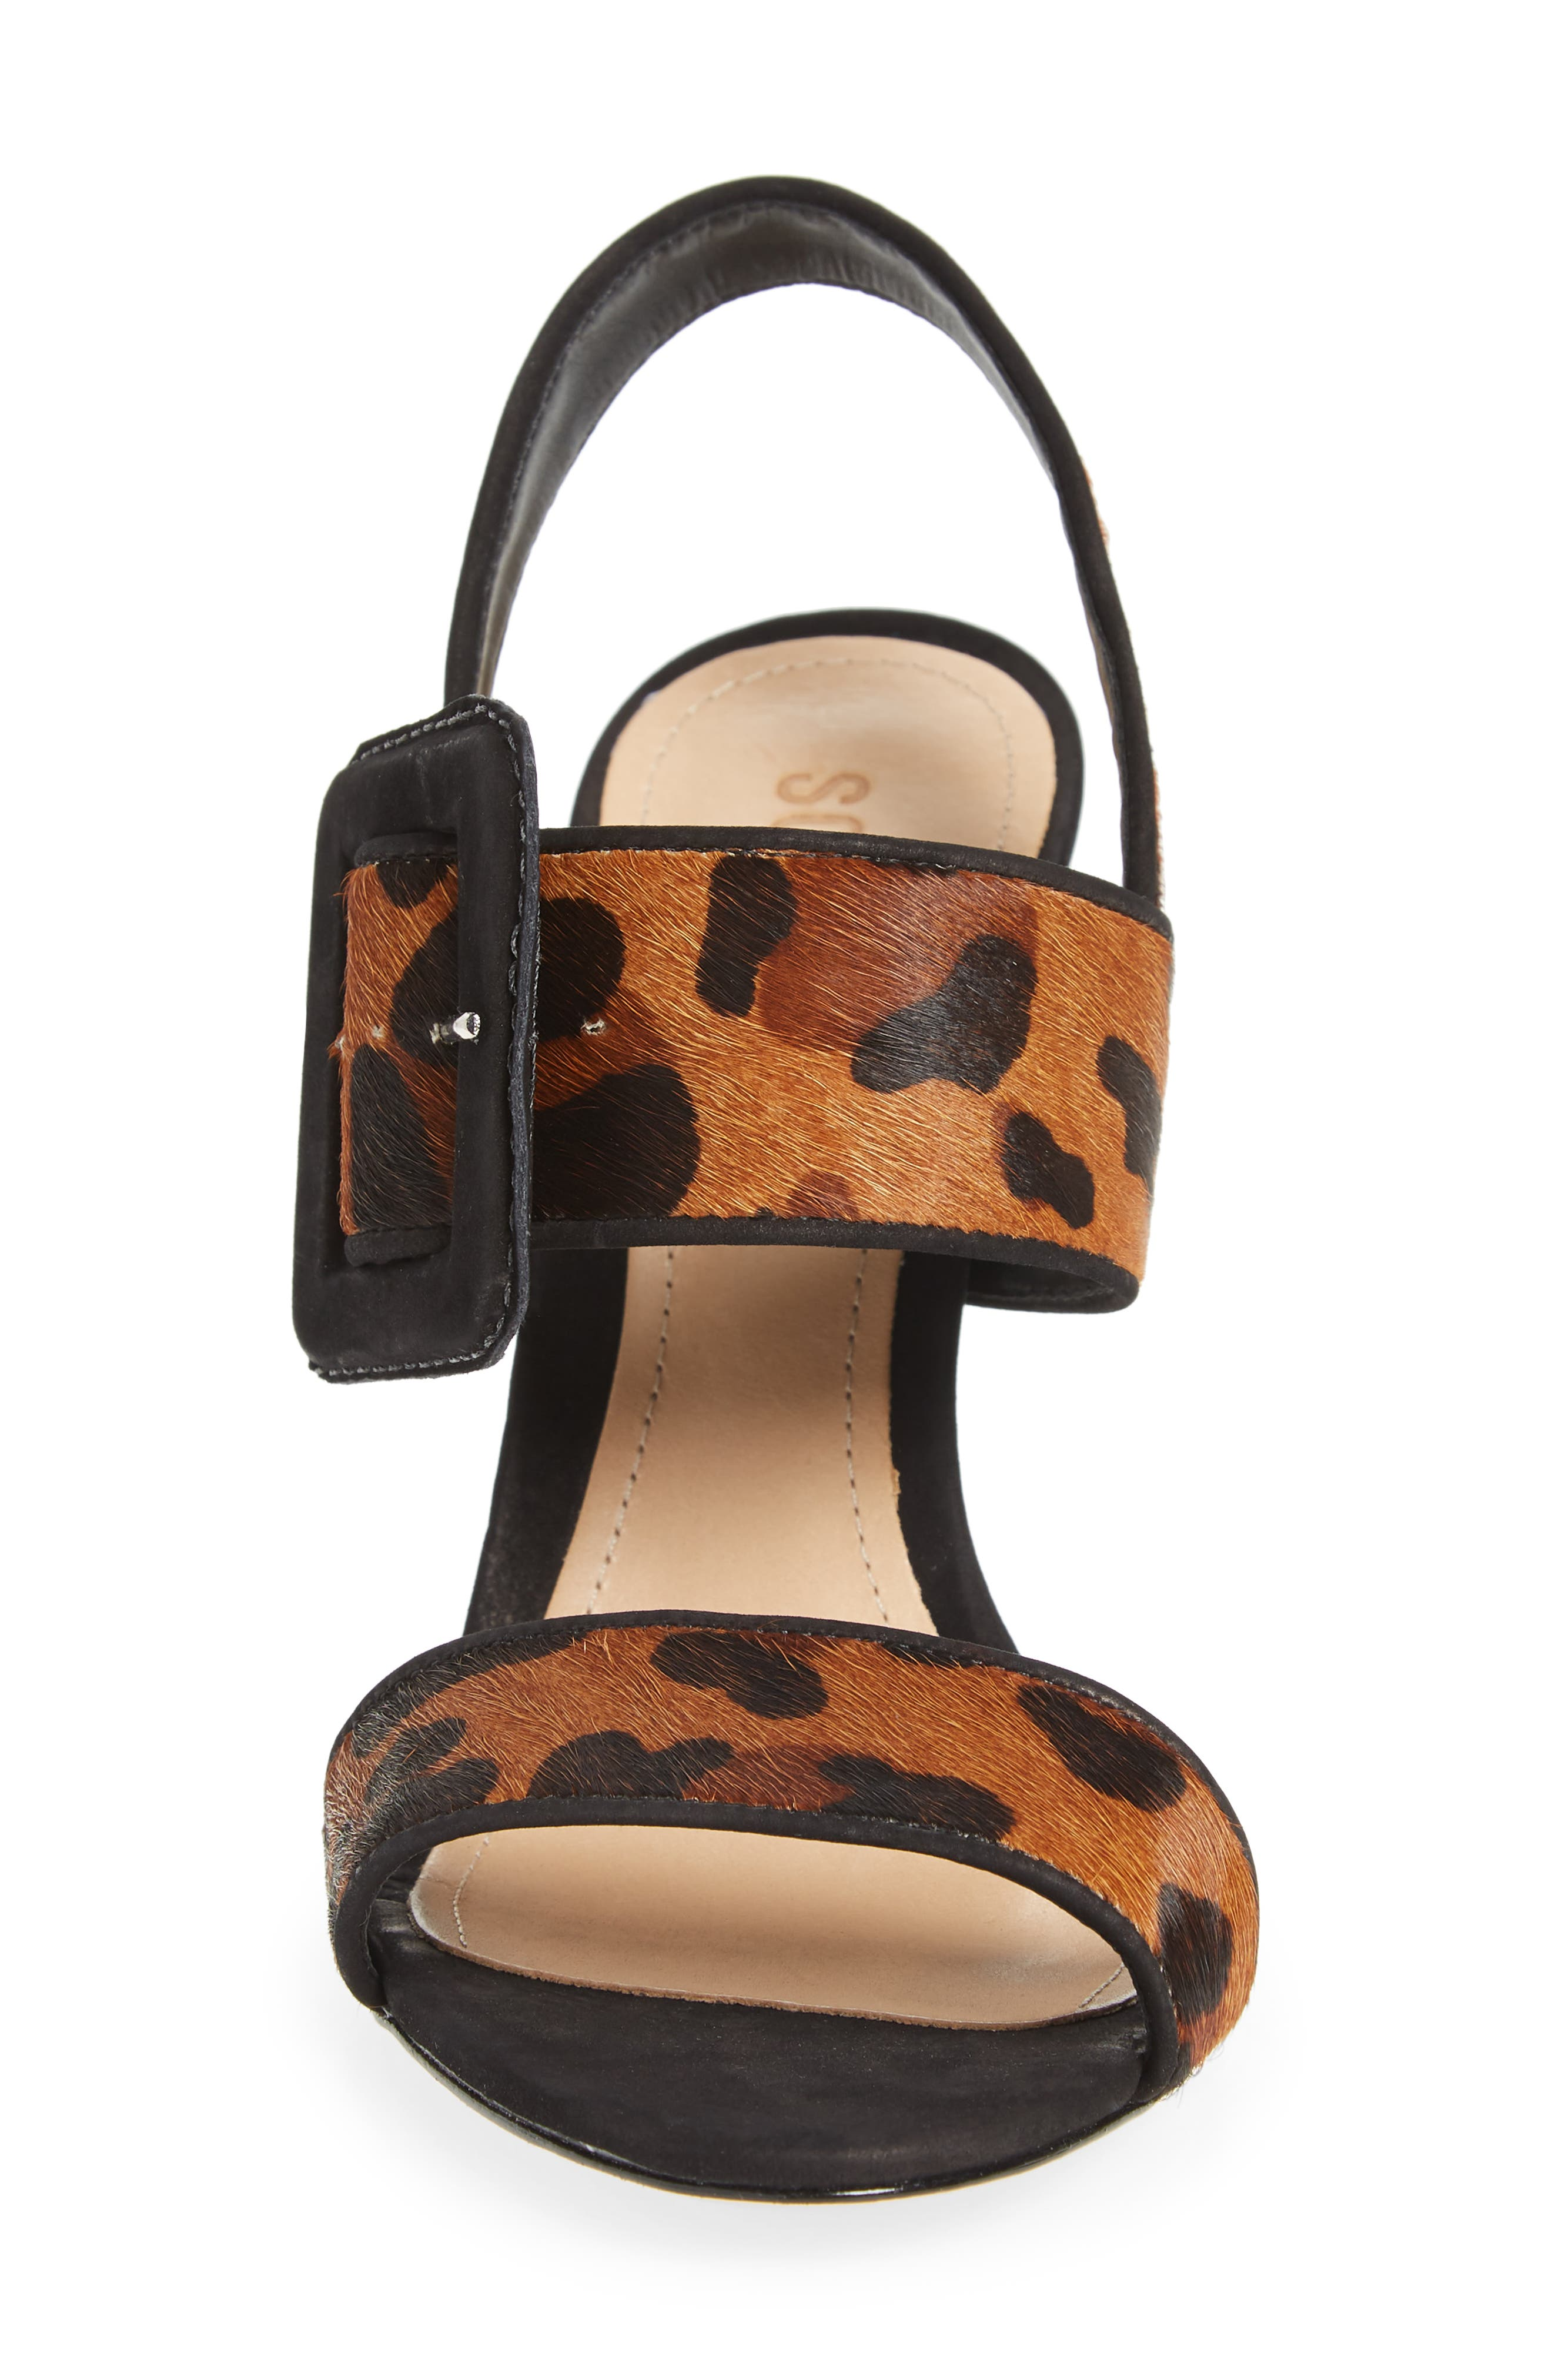 Lucci Genuine Calf Hair Sandal,                             Alternate thumbnail 4, color,                             NATURAL/ BLACK